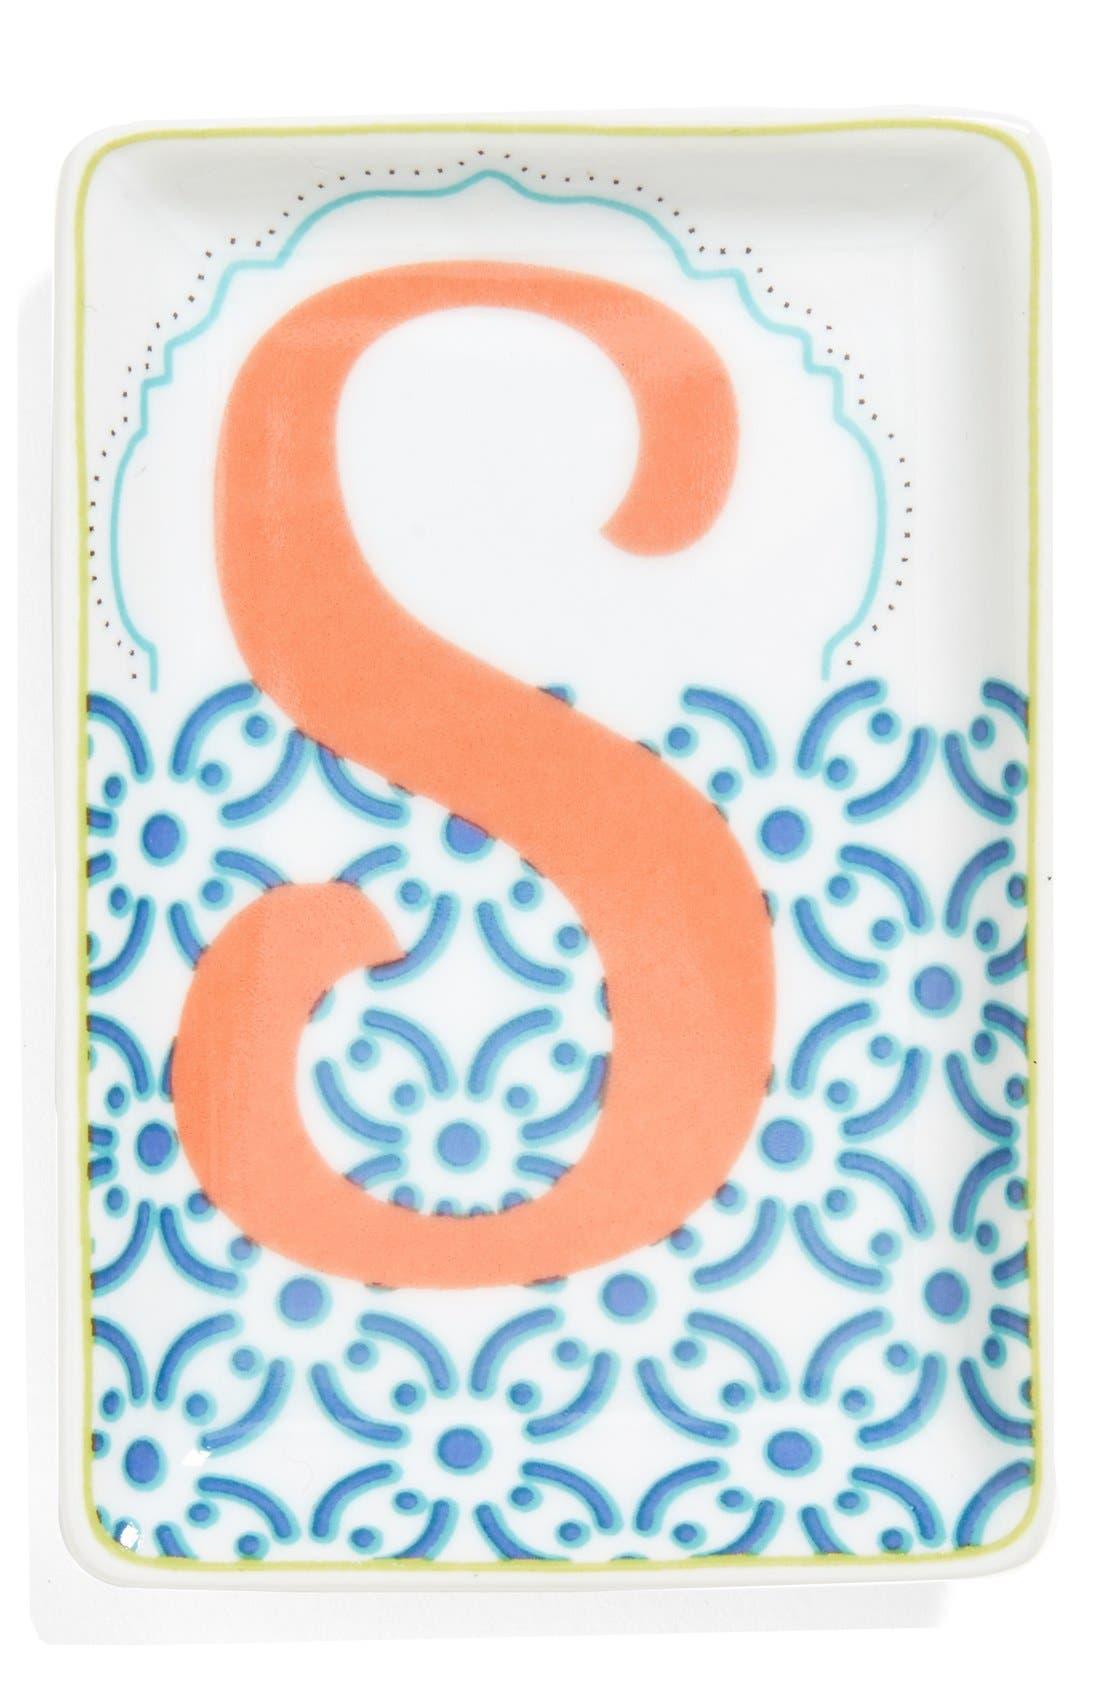 Alternate Image 1 Selected - Rosanna 'Letterpress' Personalized Porcelain Tray